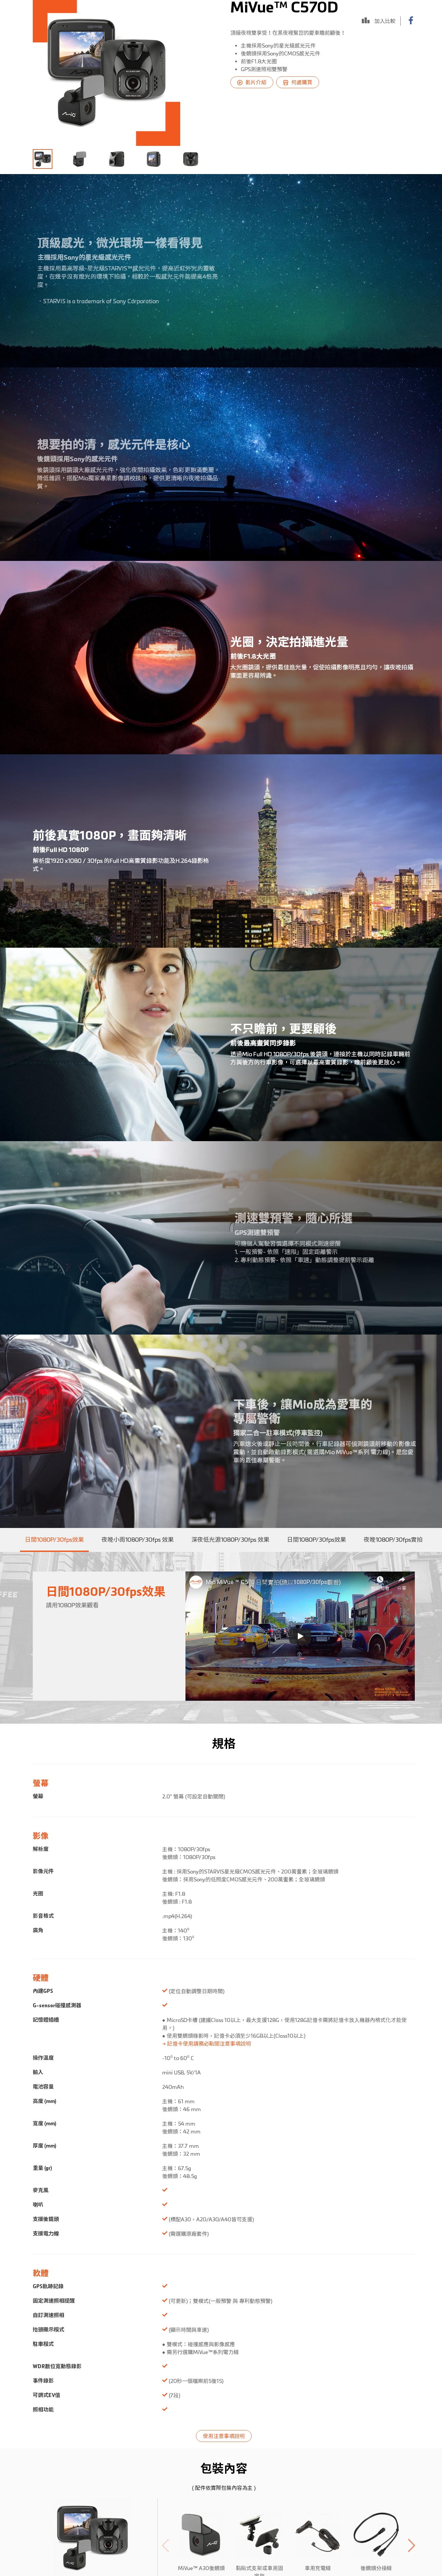 MiVue™ C570D - 螢幕系列 - 車用行車記錄器 - Mio